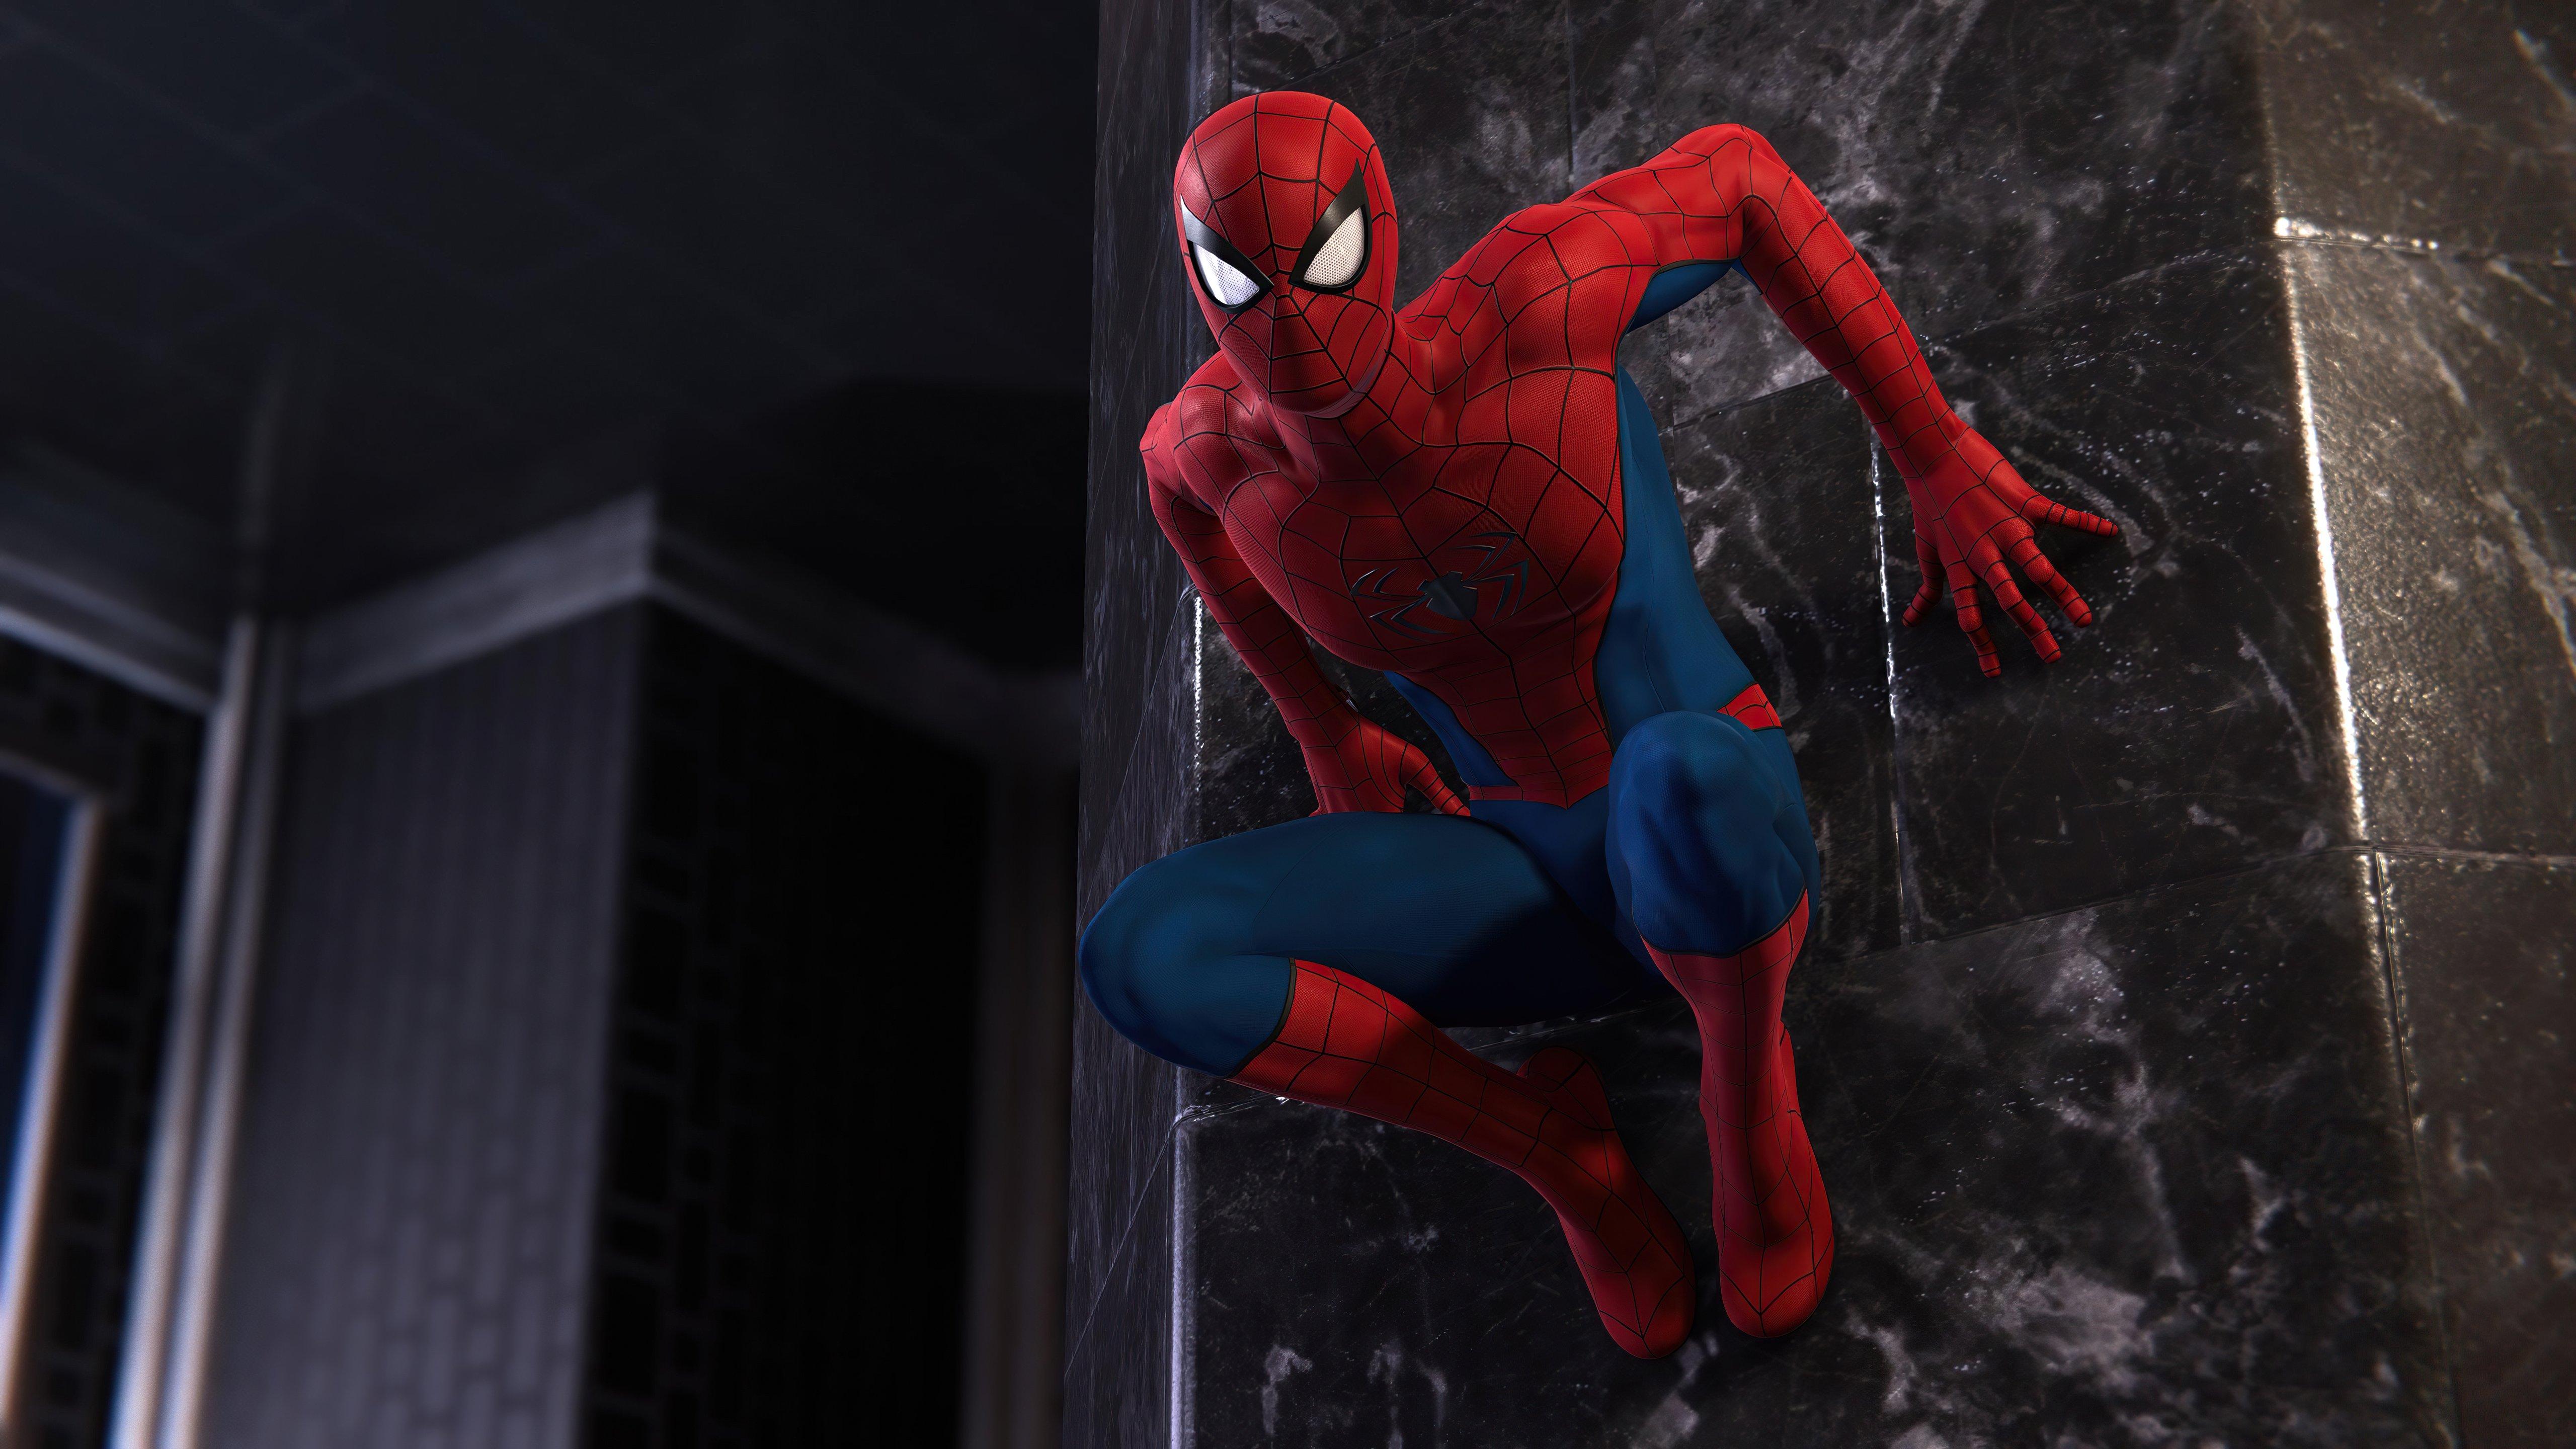 Wallpaper Spider Man on wall